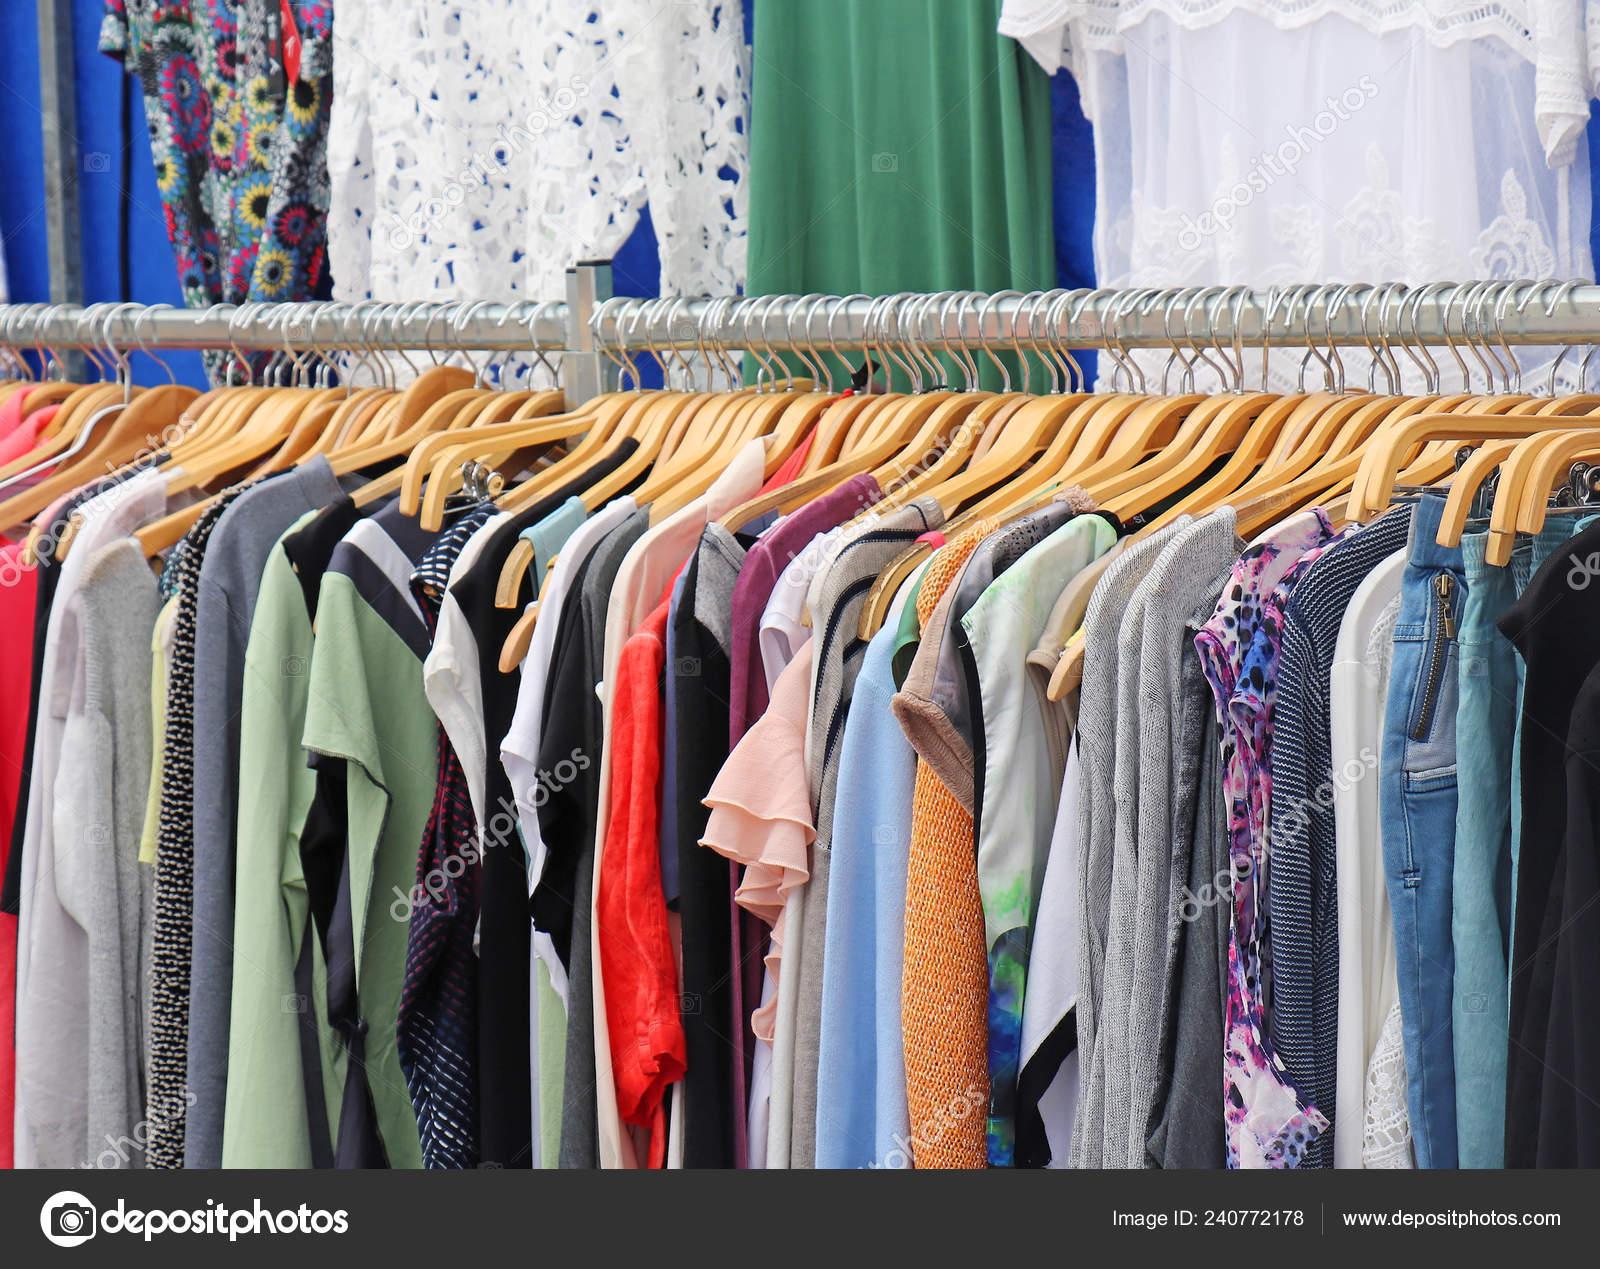 306c44ba3680 Στοίβα από πολύχρωμα ρούχα στις ξύλινες κρεμάστρες που πωλούνται στην αγορά  — Εικόνα από ...